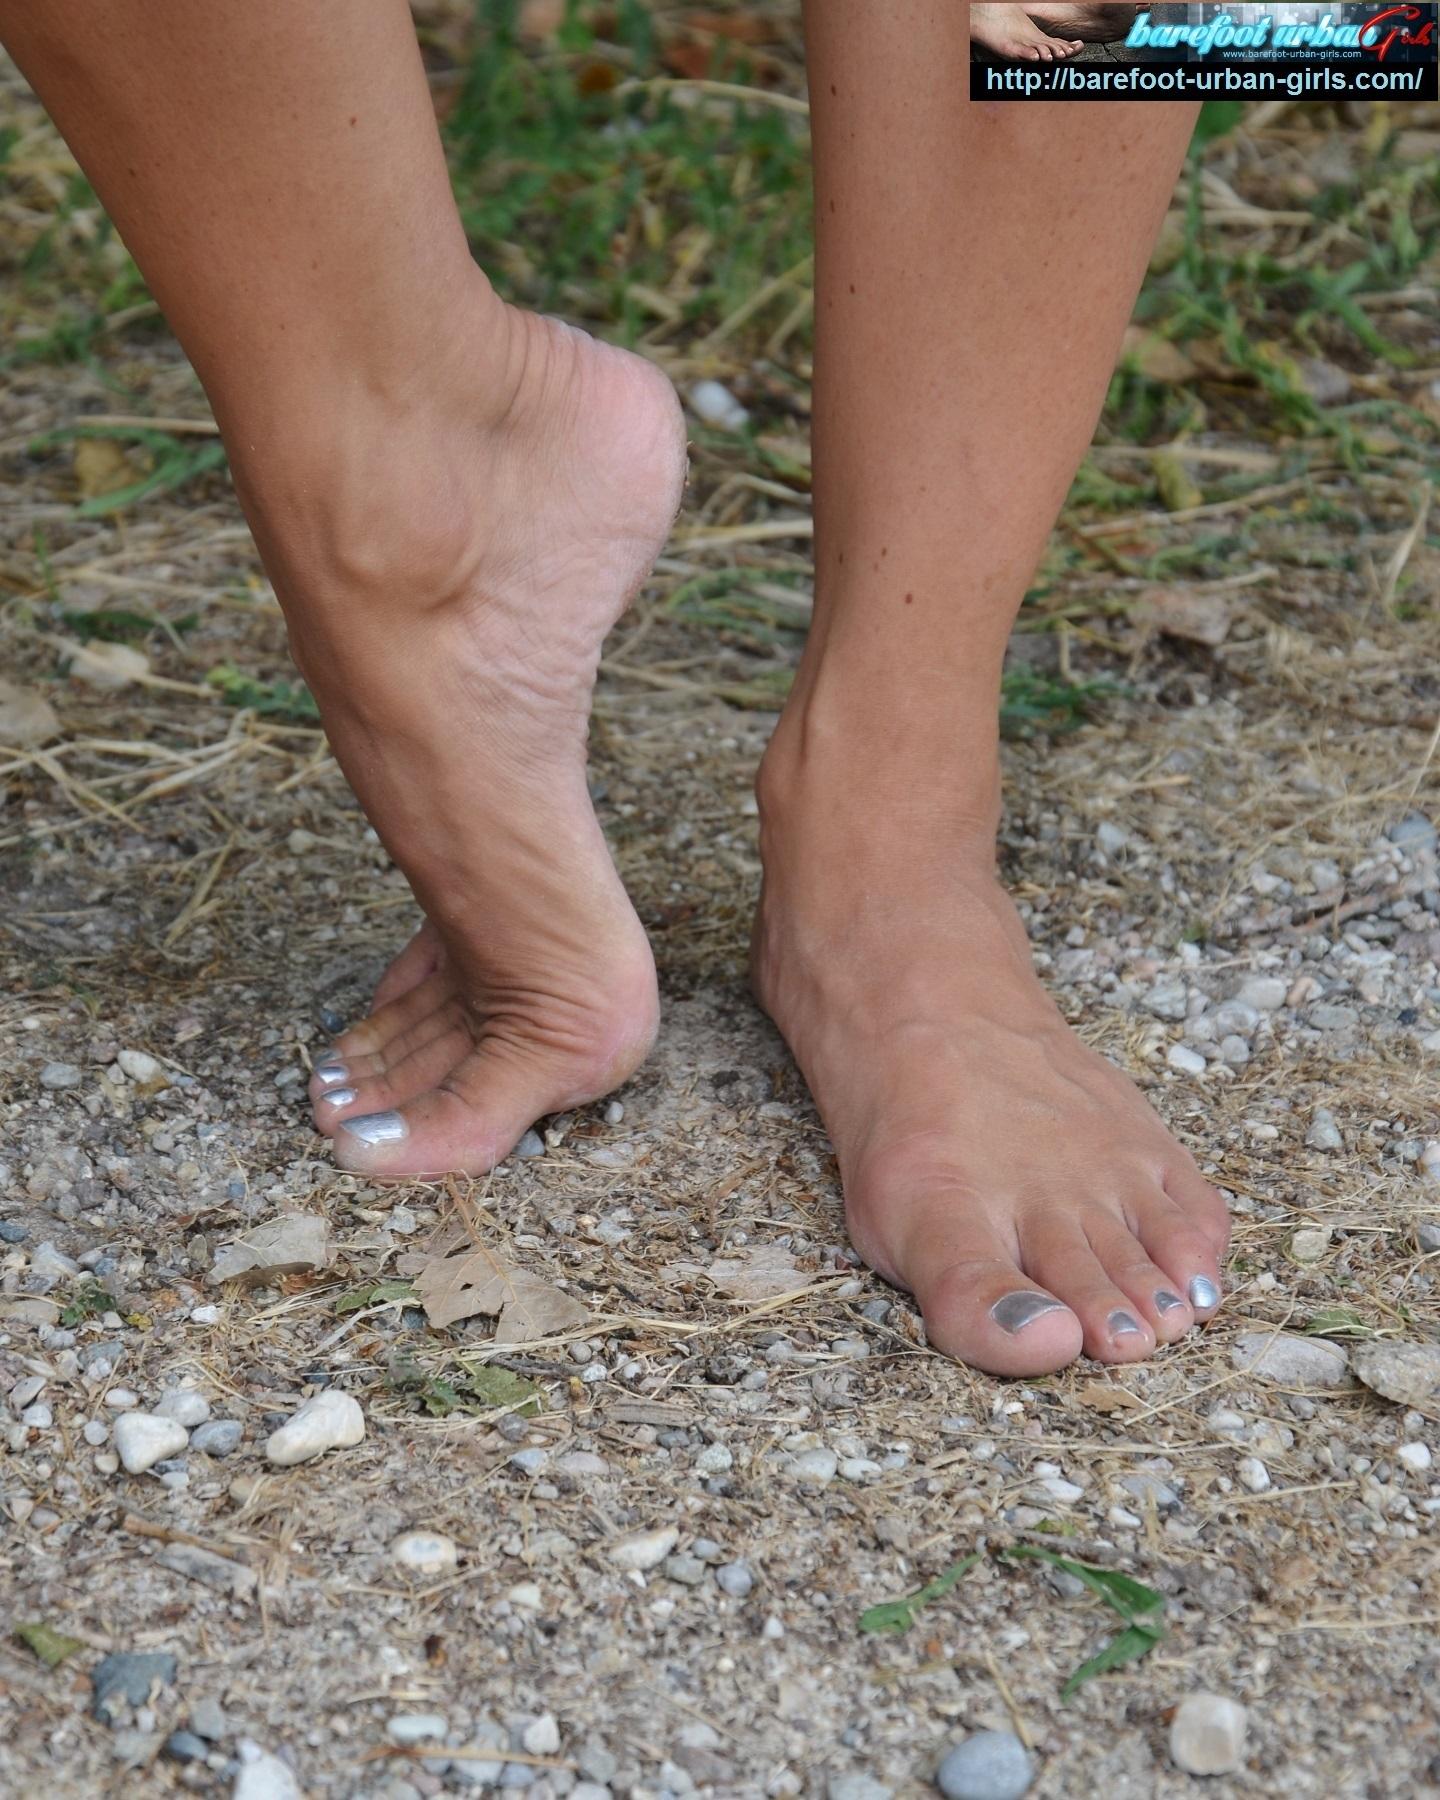 http://barefoot-urban-girls.com/free/pics/20181006074840_30839/demo0002.jpg